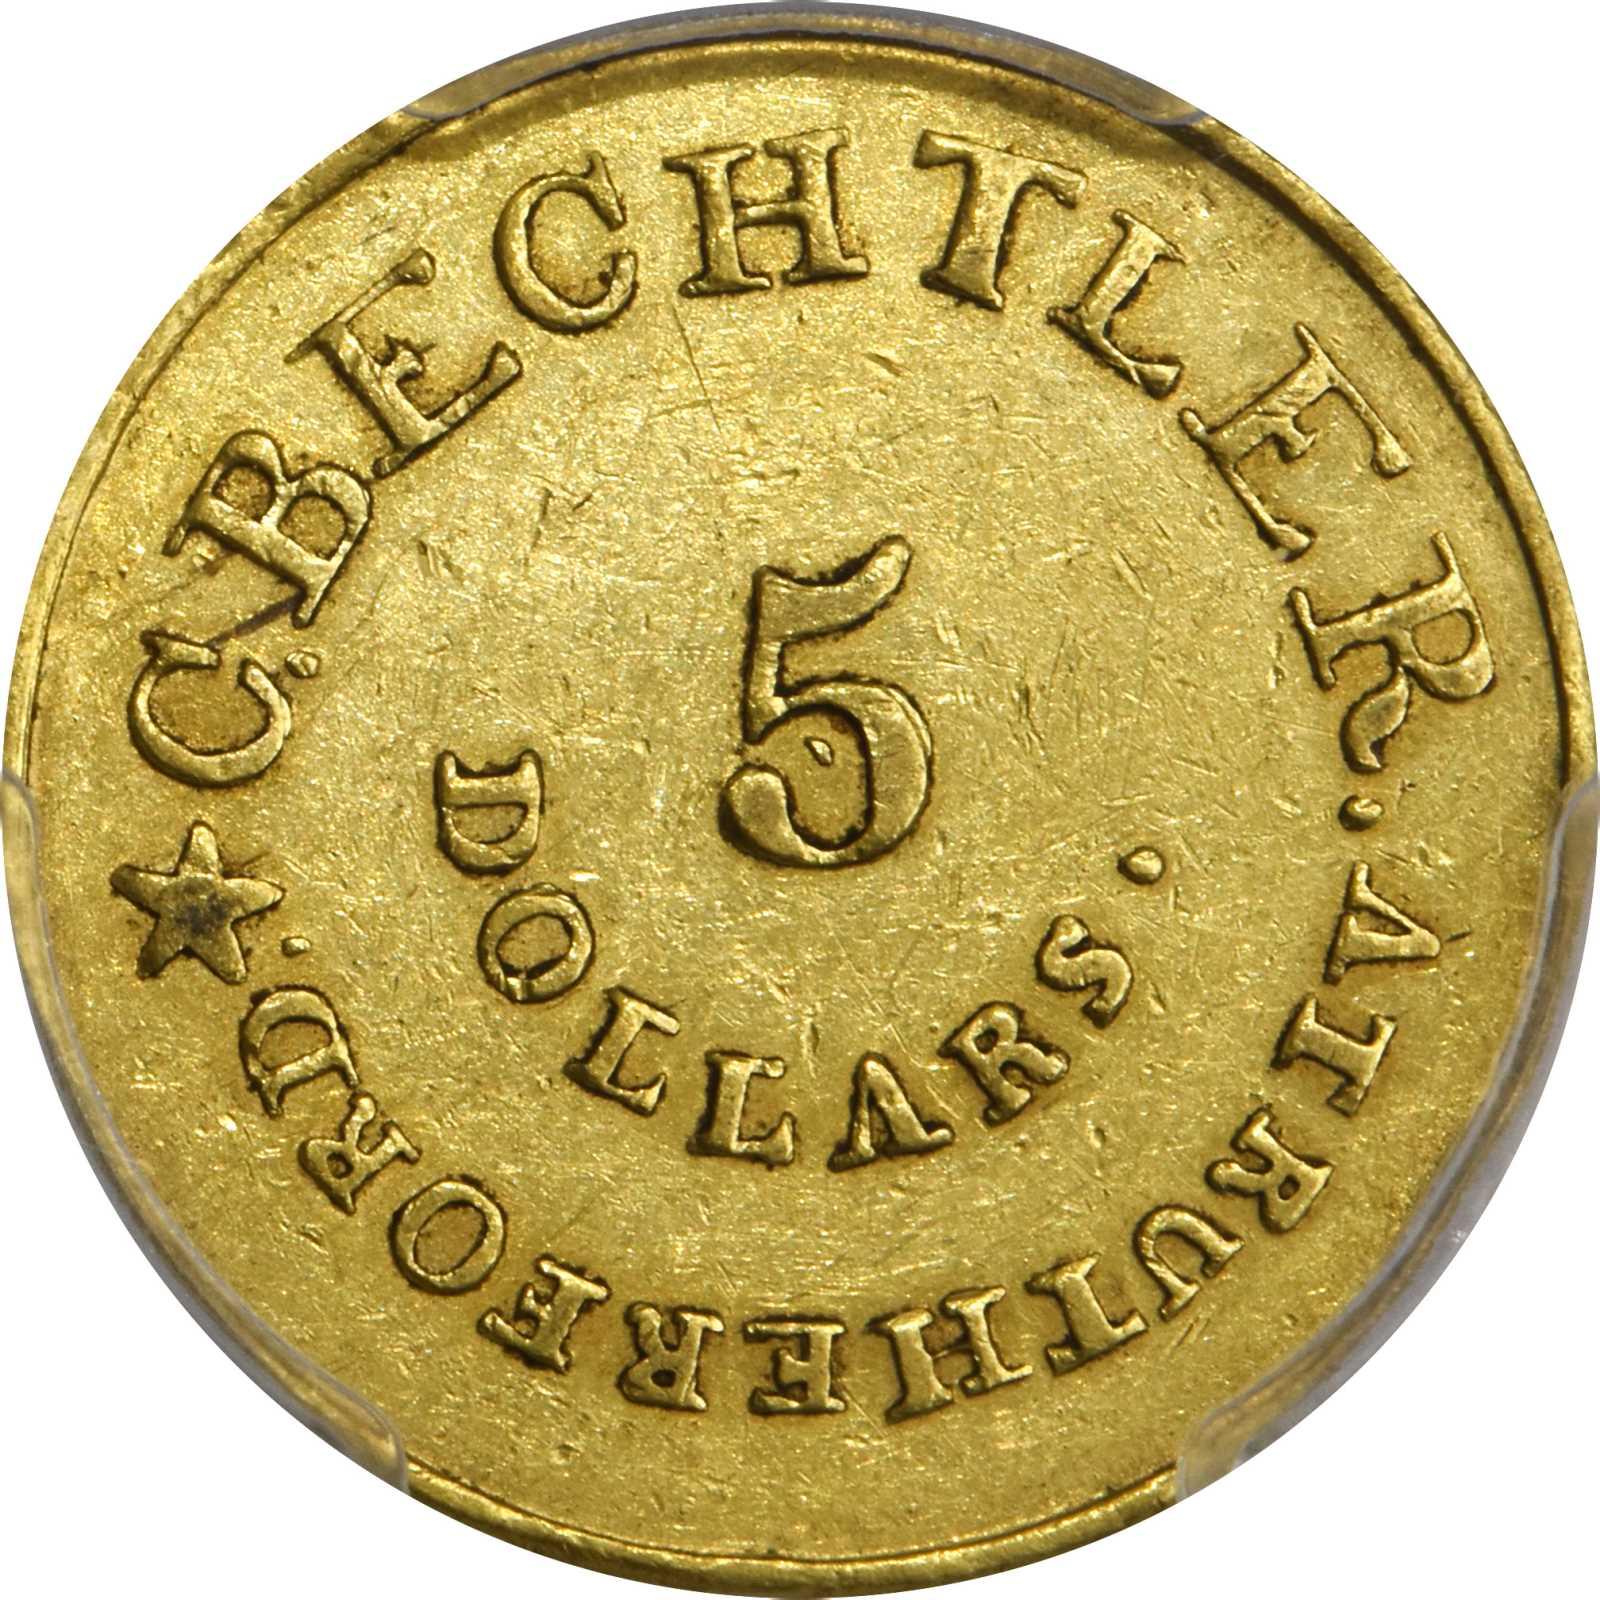 sample image for C.Becht $5 GEORGIA, 128 GR, 22C (K-22)